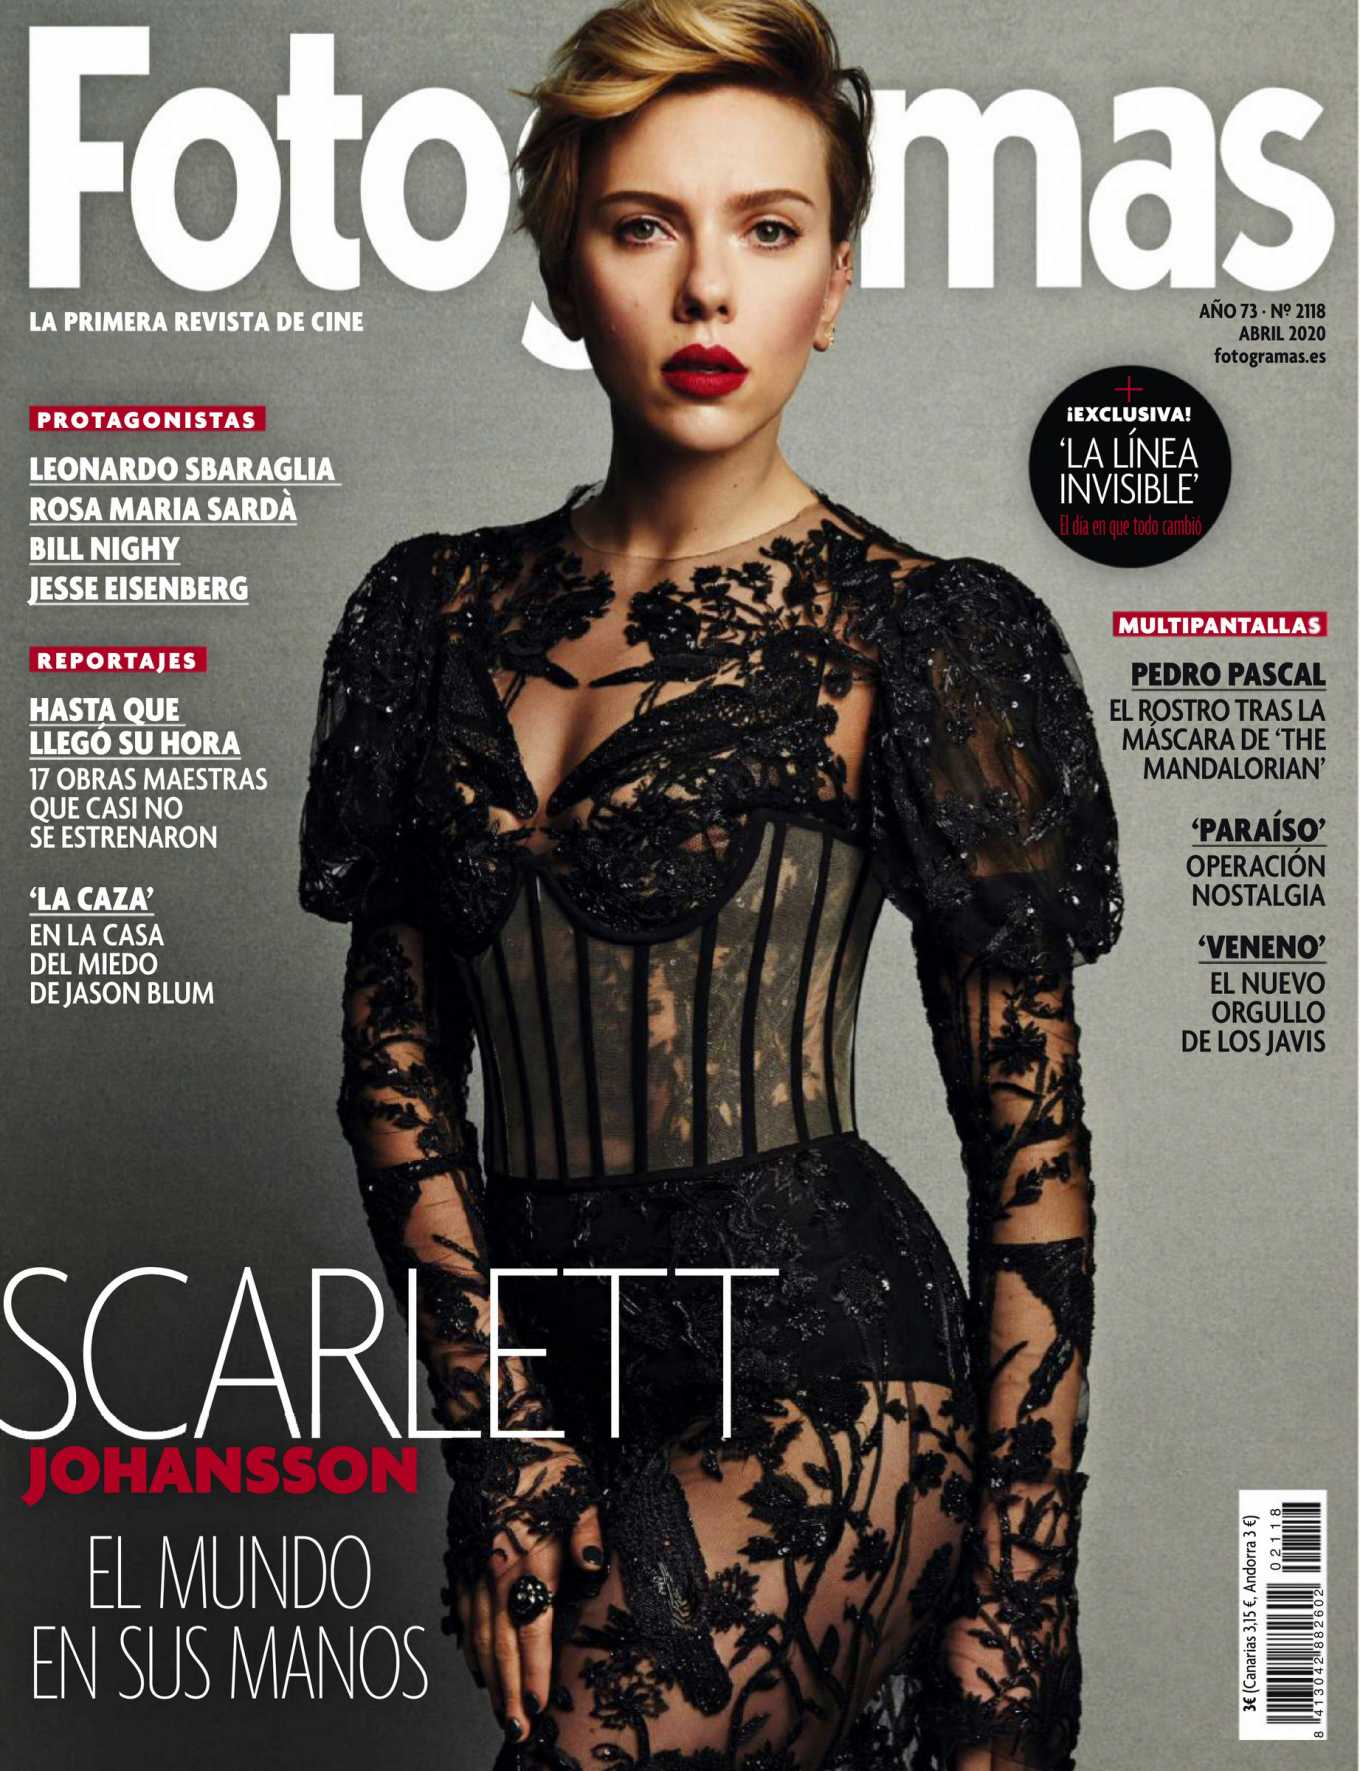 Scarlett Johansson - Fotogramas Magazine (April 2020)